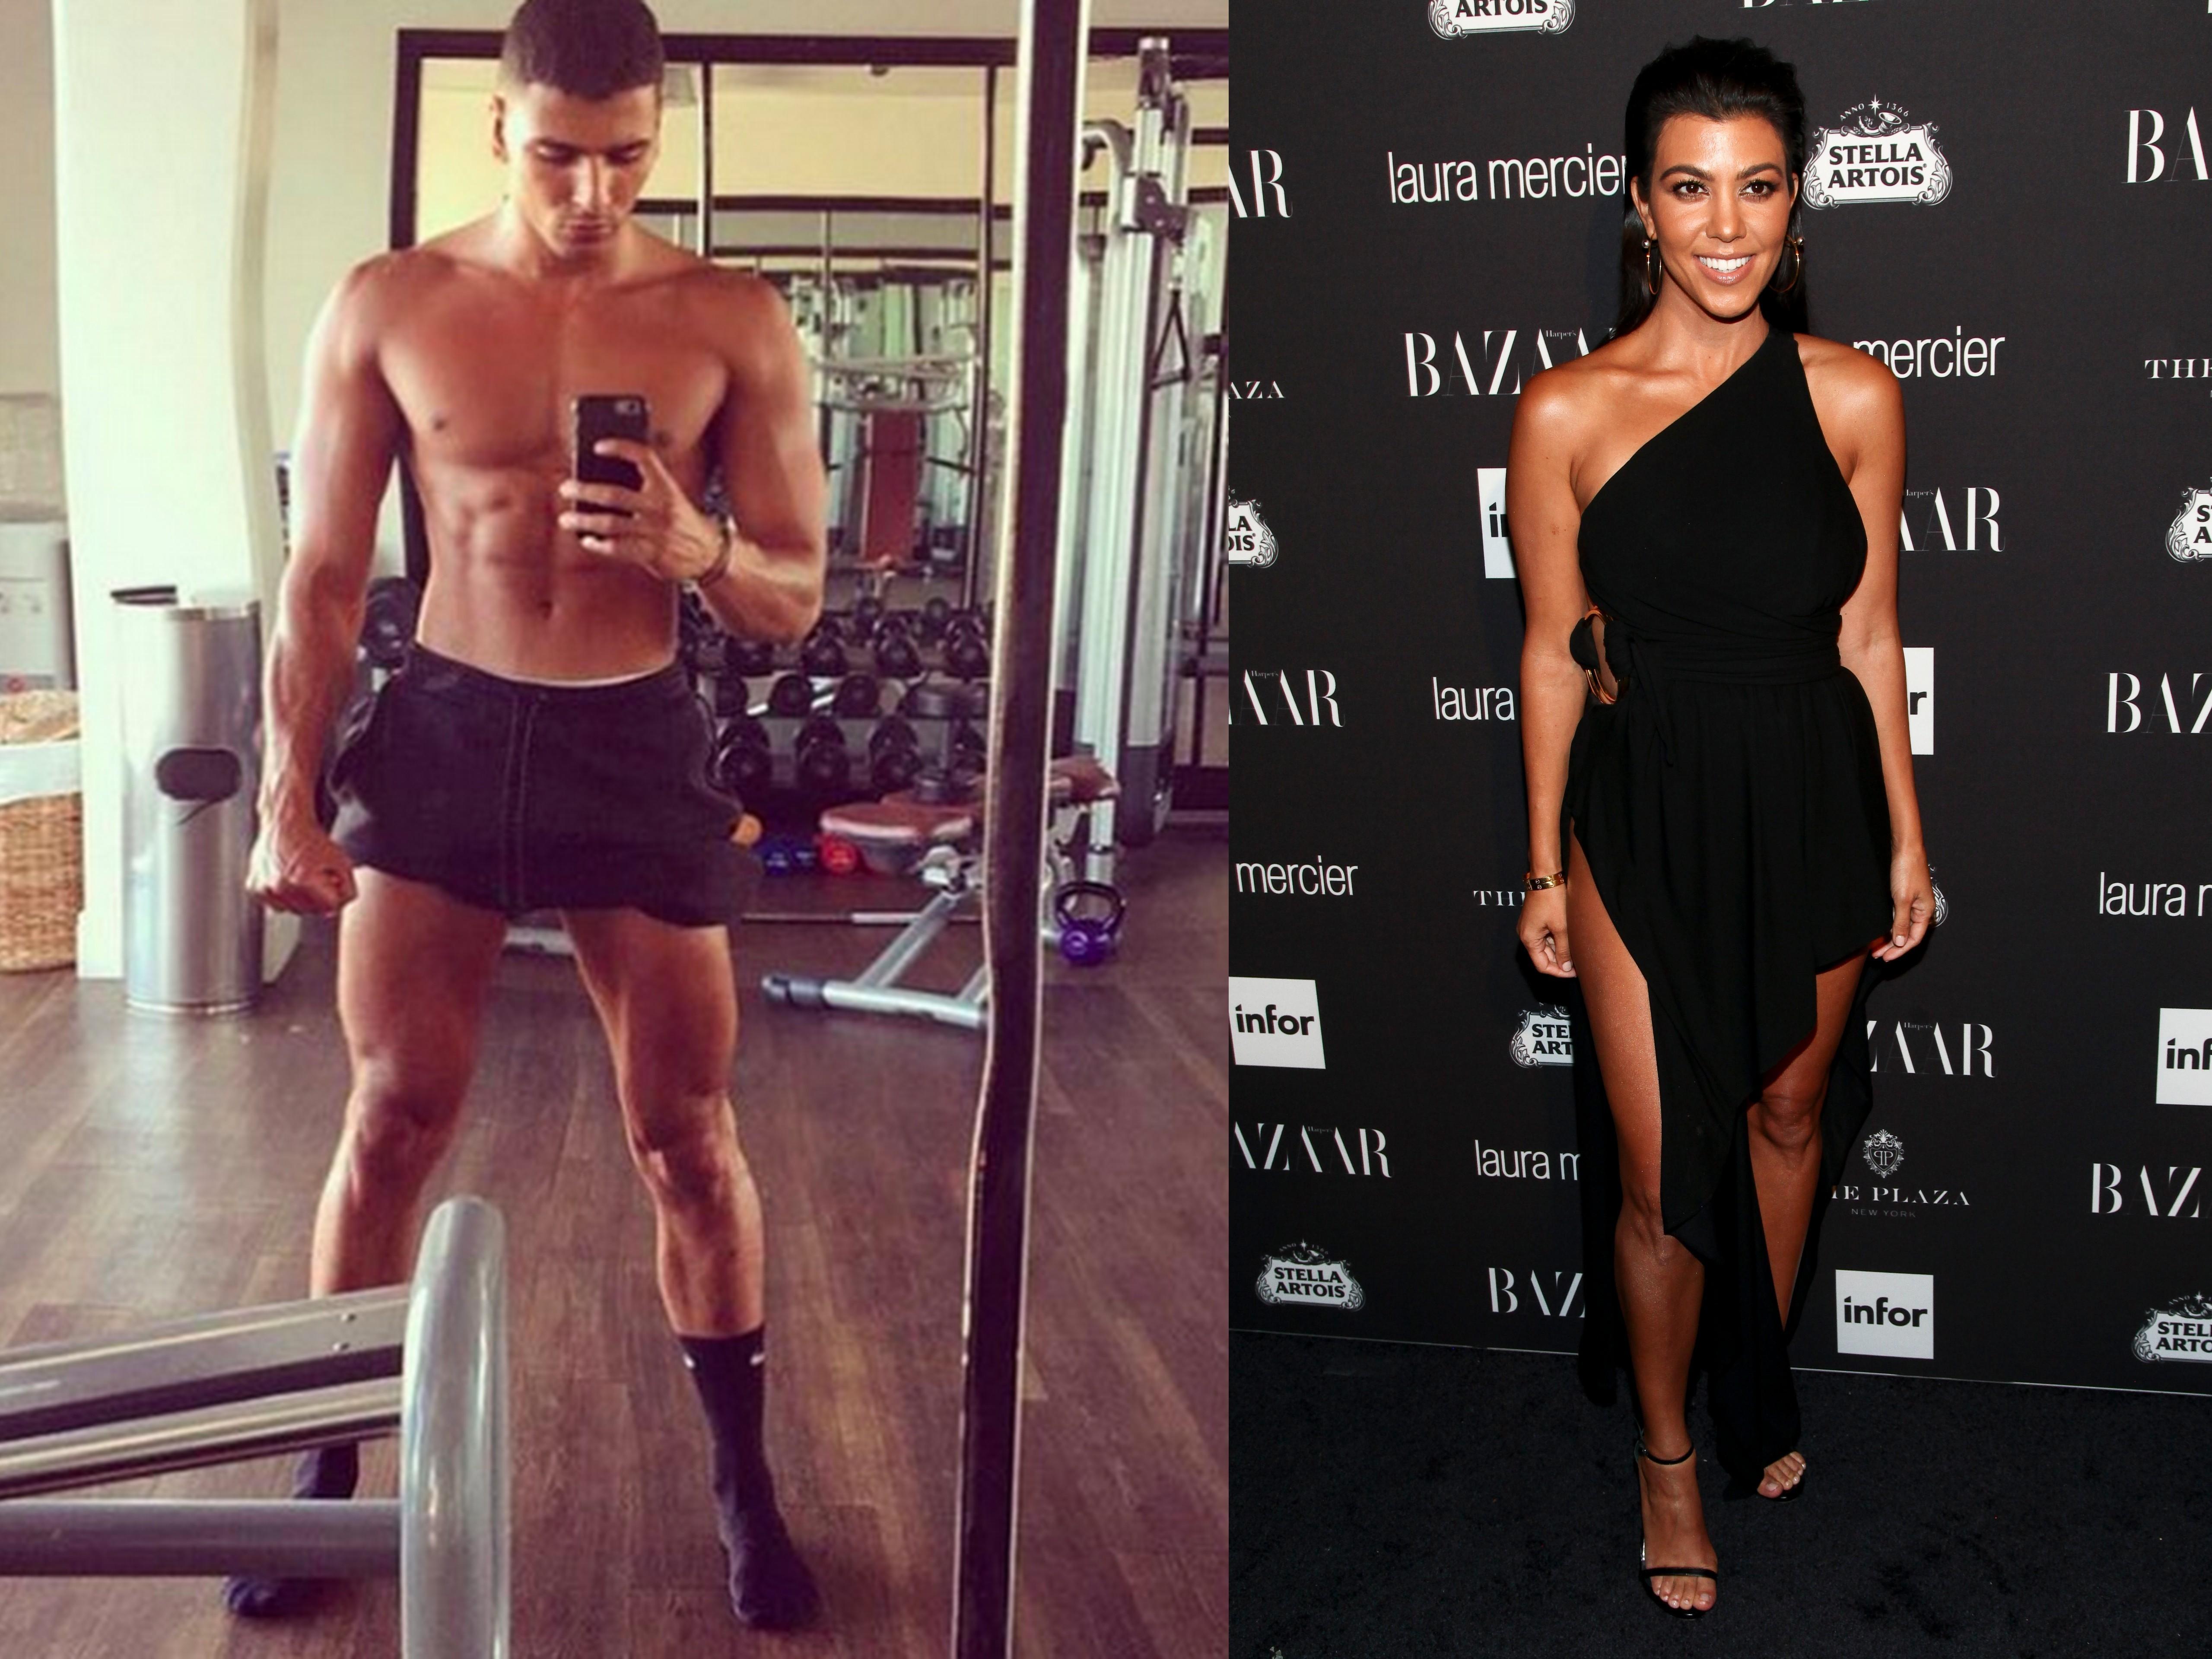 Romance rumors hit Kourtney Kardashian, 23 year old model `